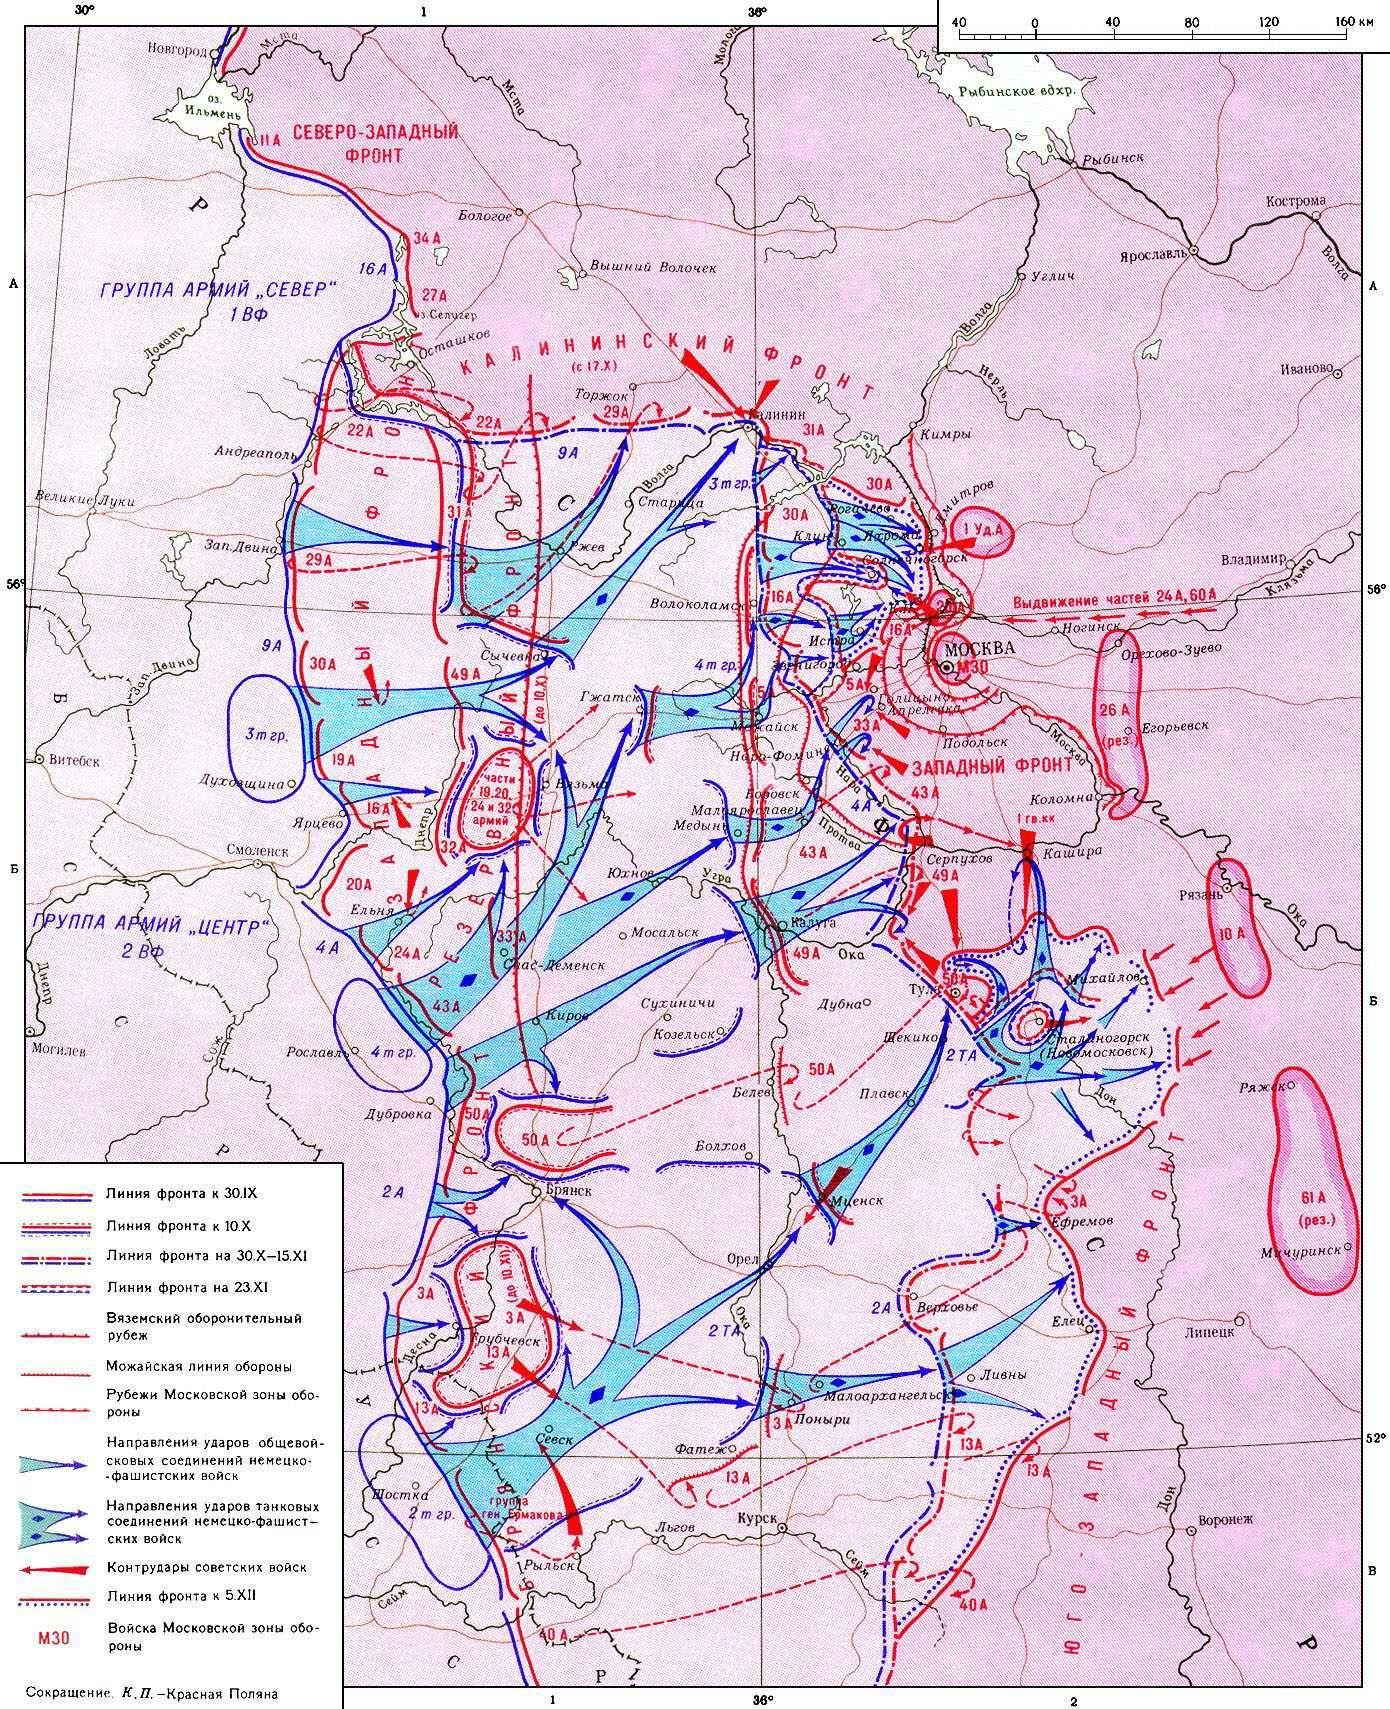 Bитва за Москву | Battle of Moscow (Map) | Red Army (Красная Армия ...